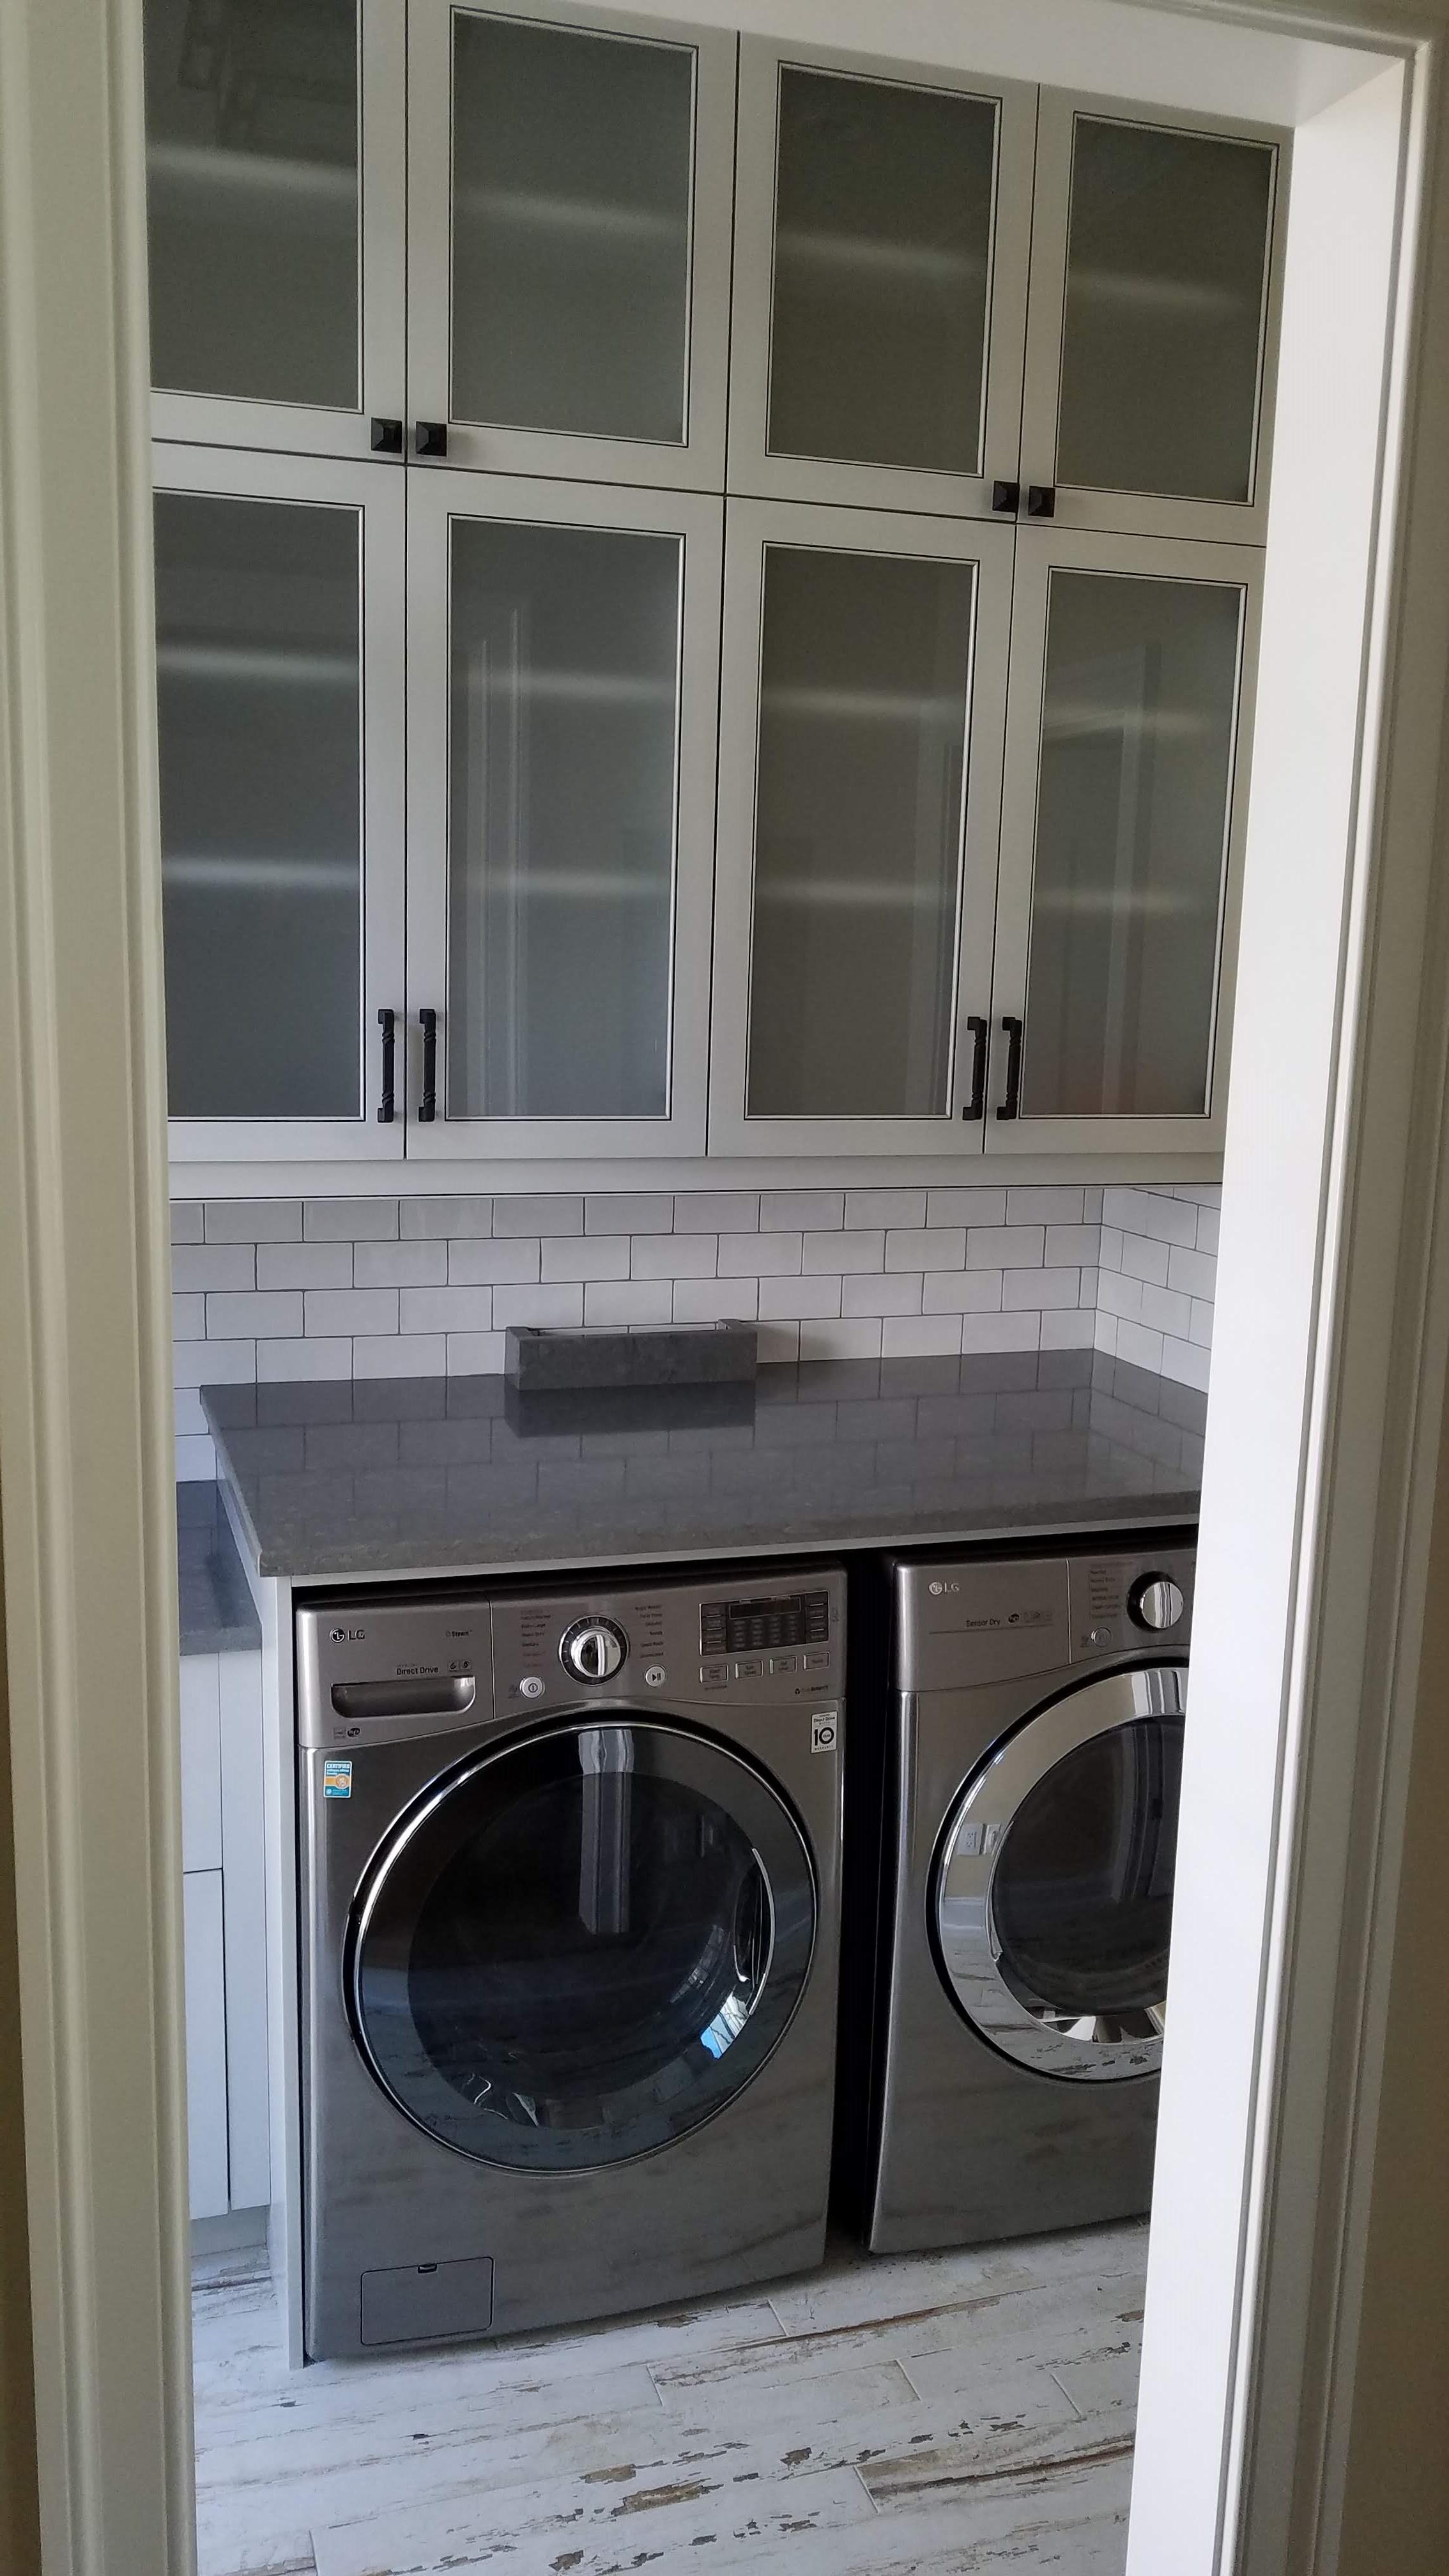 https://0201.nccdn.net/1_2/000/000/144/3f9/laundry.png